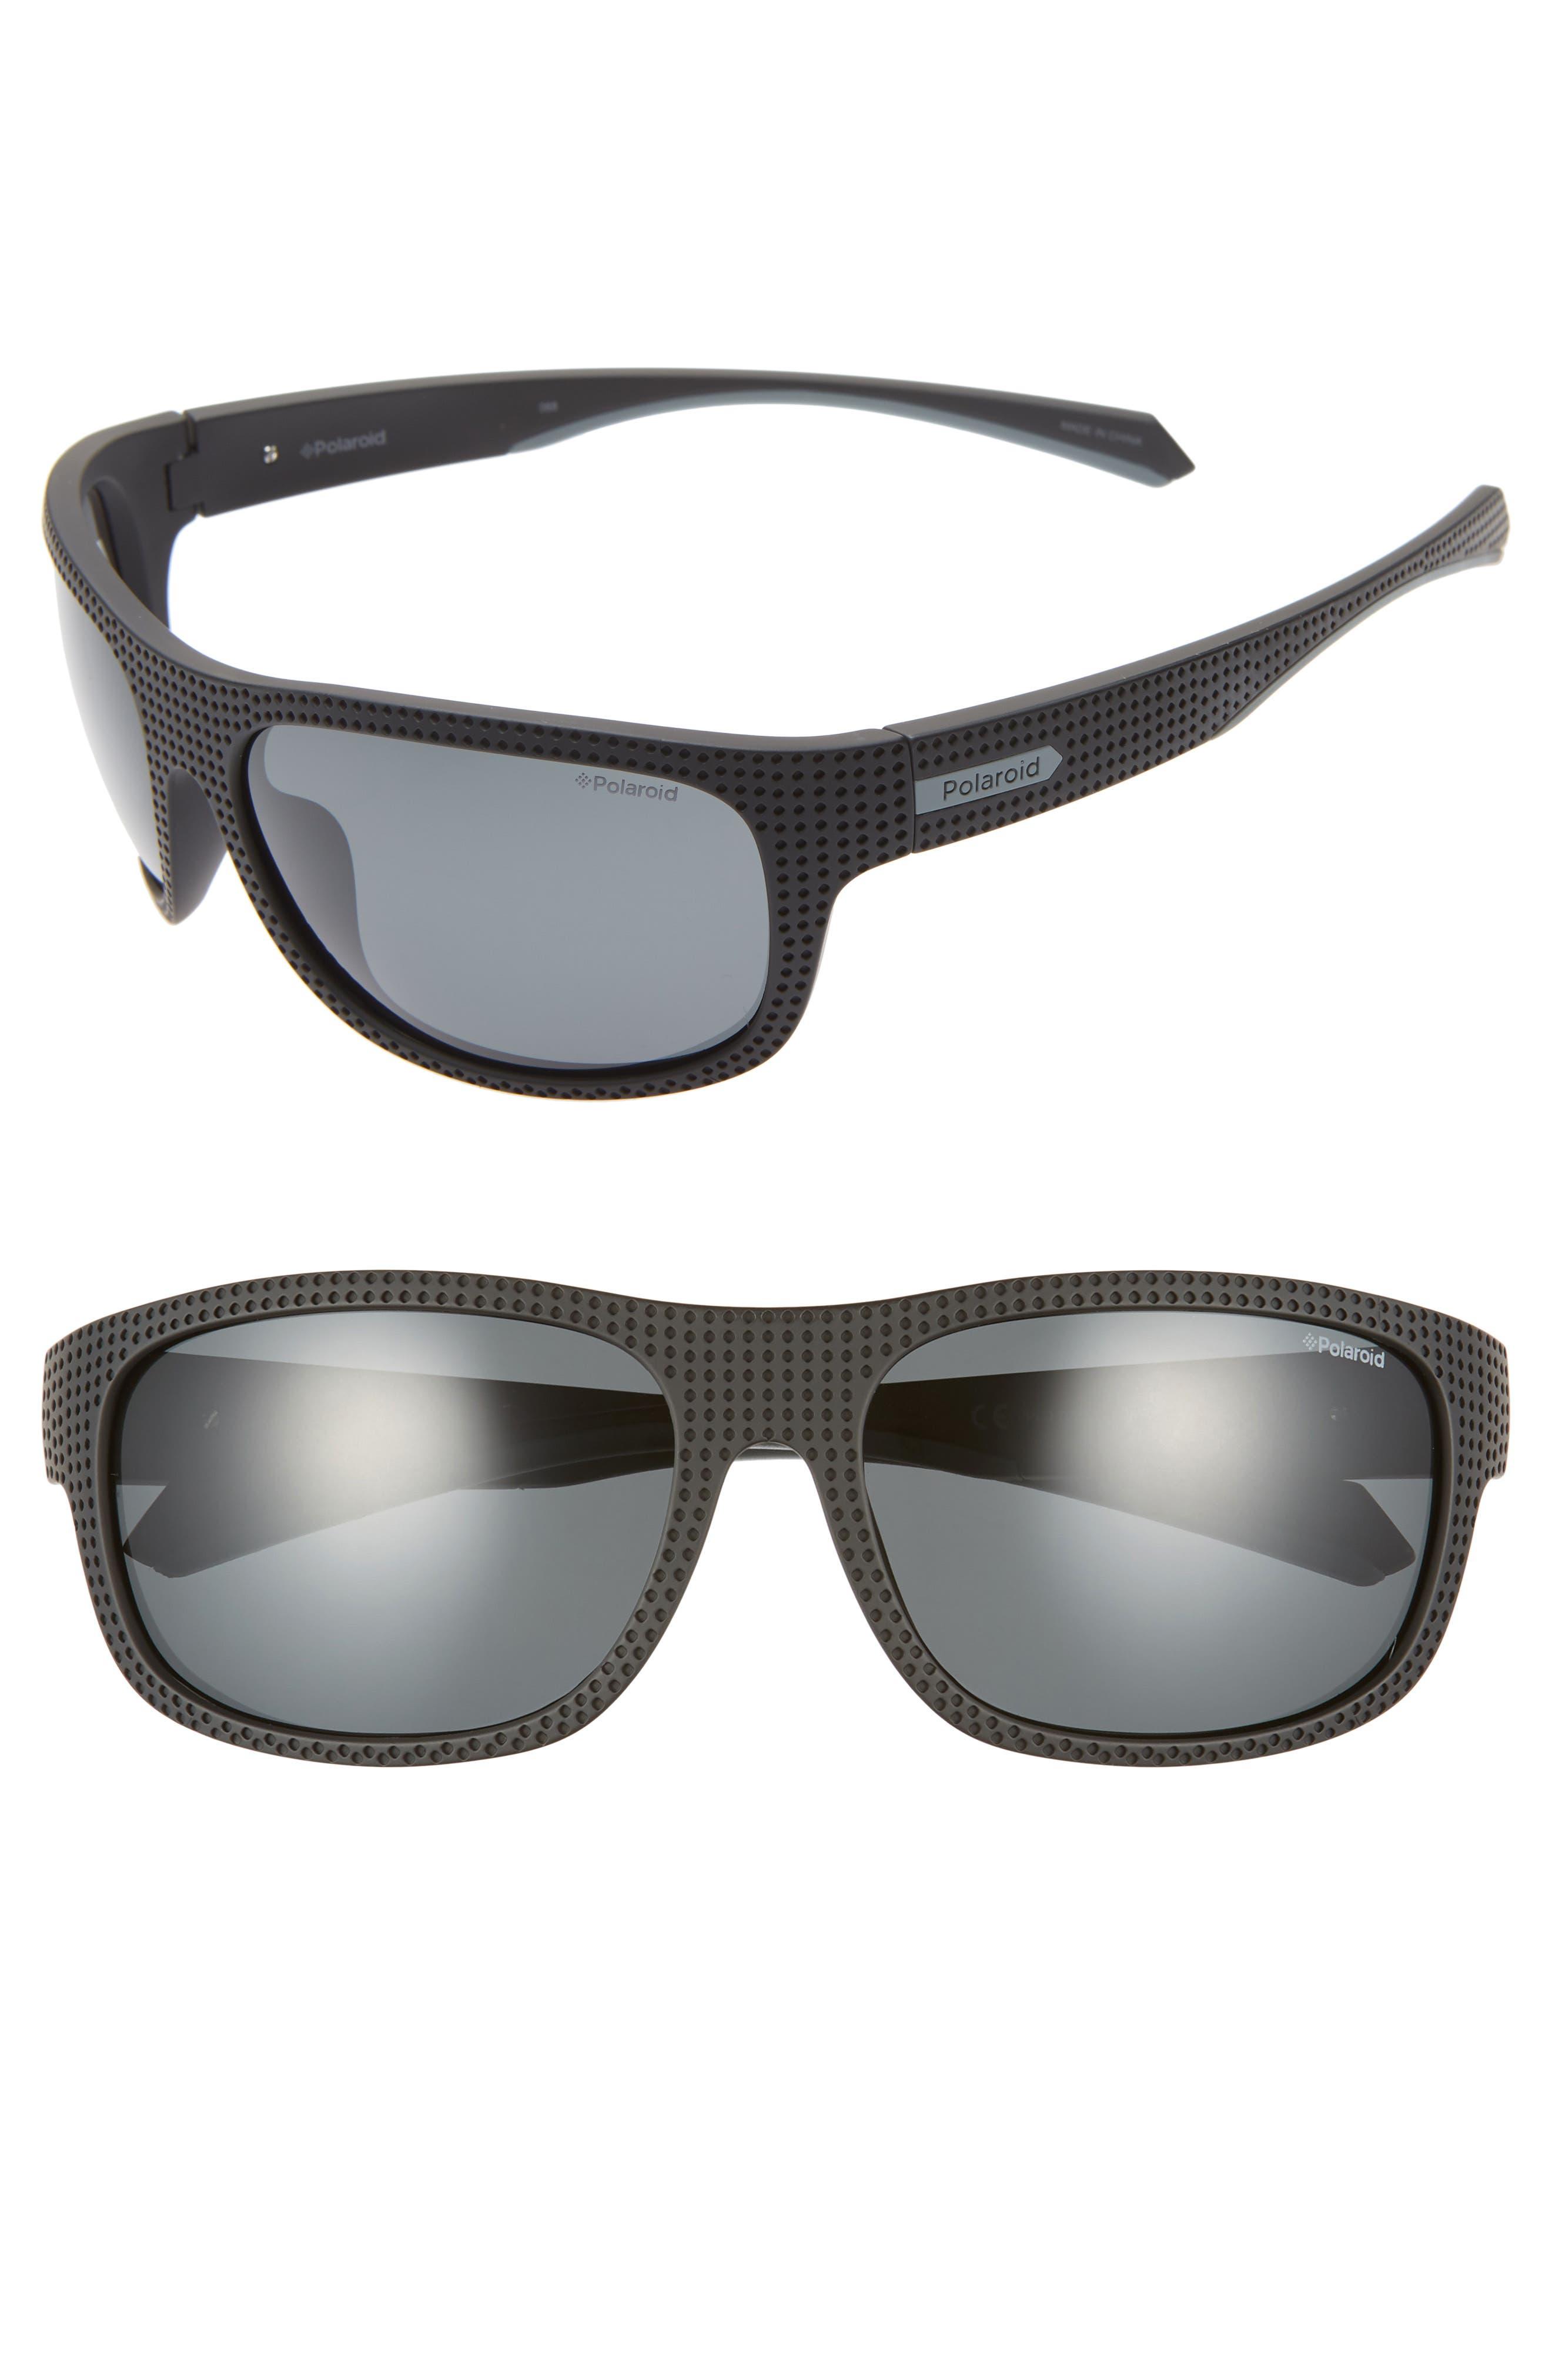 Polaroid Plastic Wrap 6m Polarized Sunglasses - Black